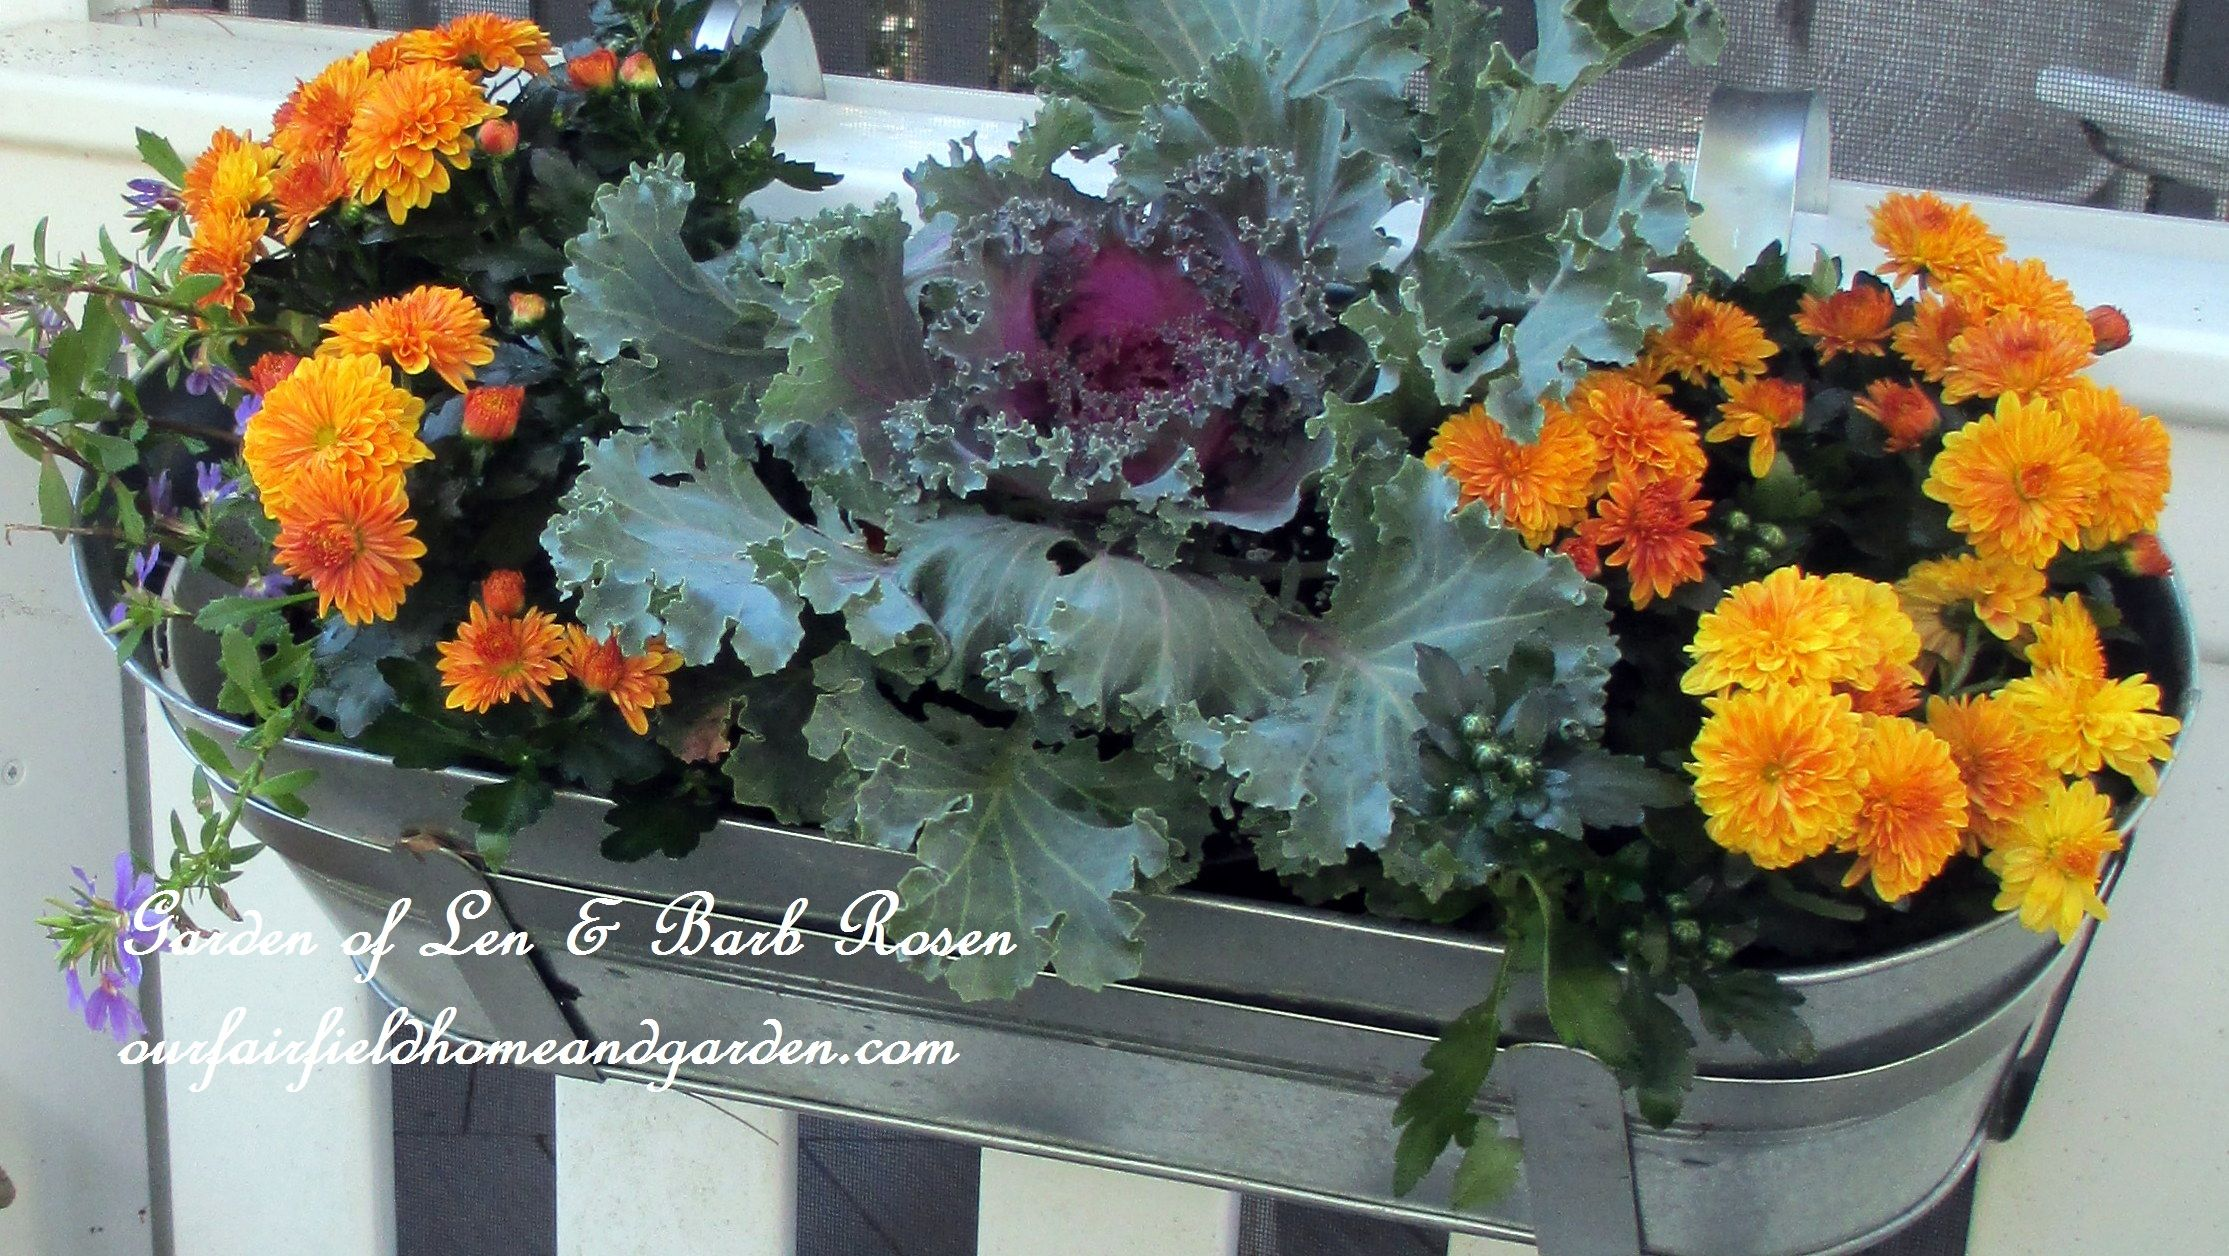 Gazebo window box (Garden of Len & Barb Rosen)